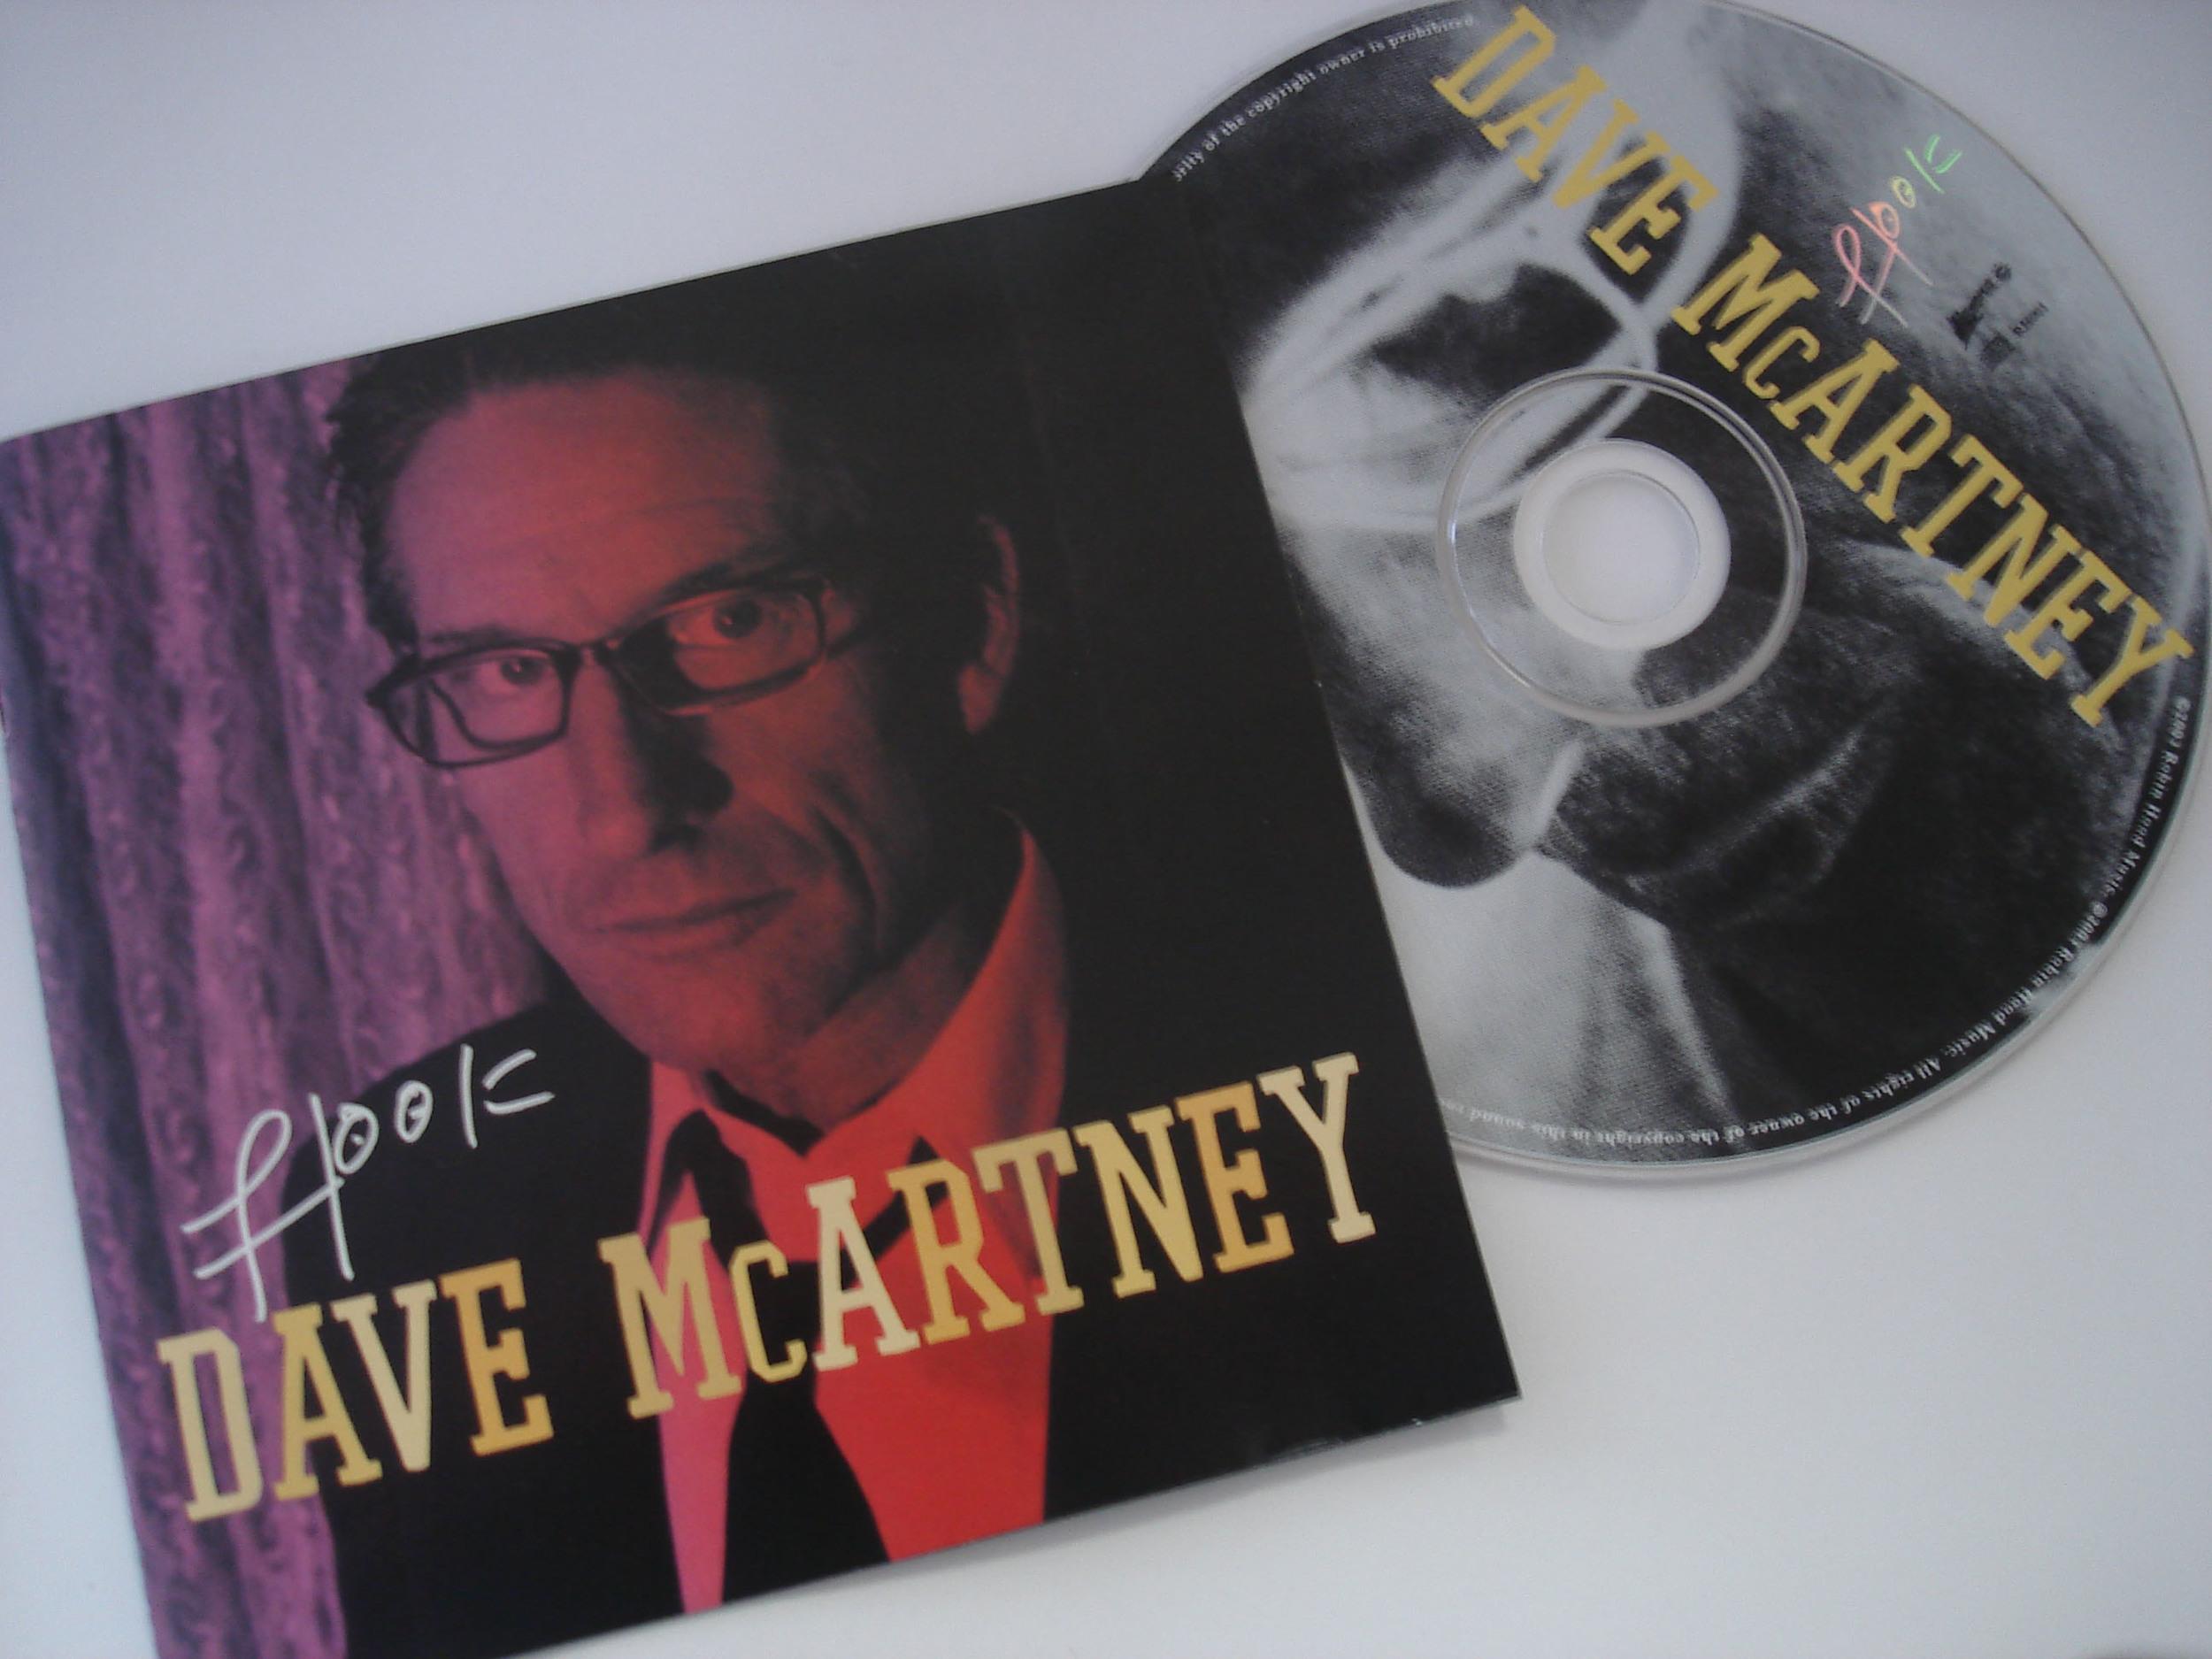 DAVE MCARTNEY - HOOK - ALBUM